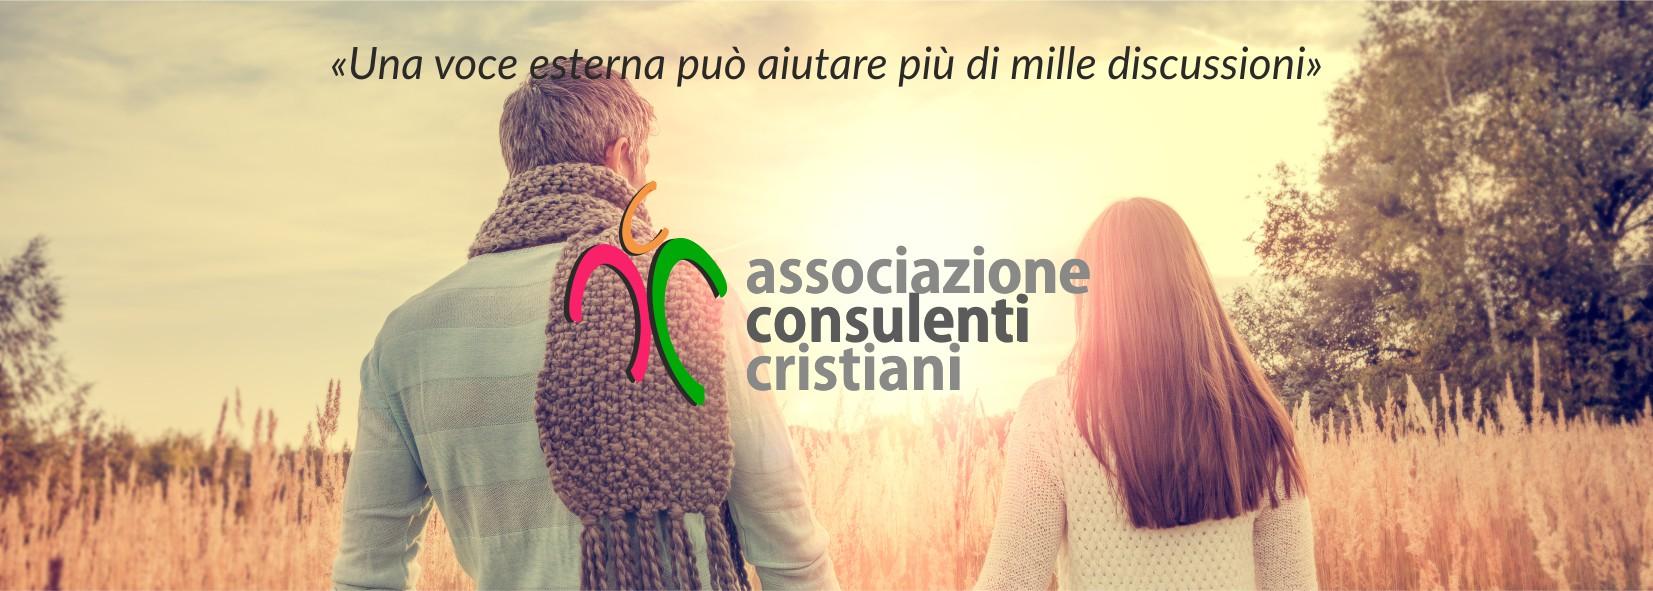 Associazione Consulenti Cristiani